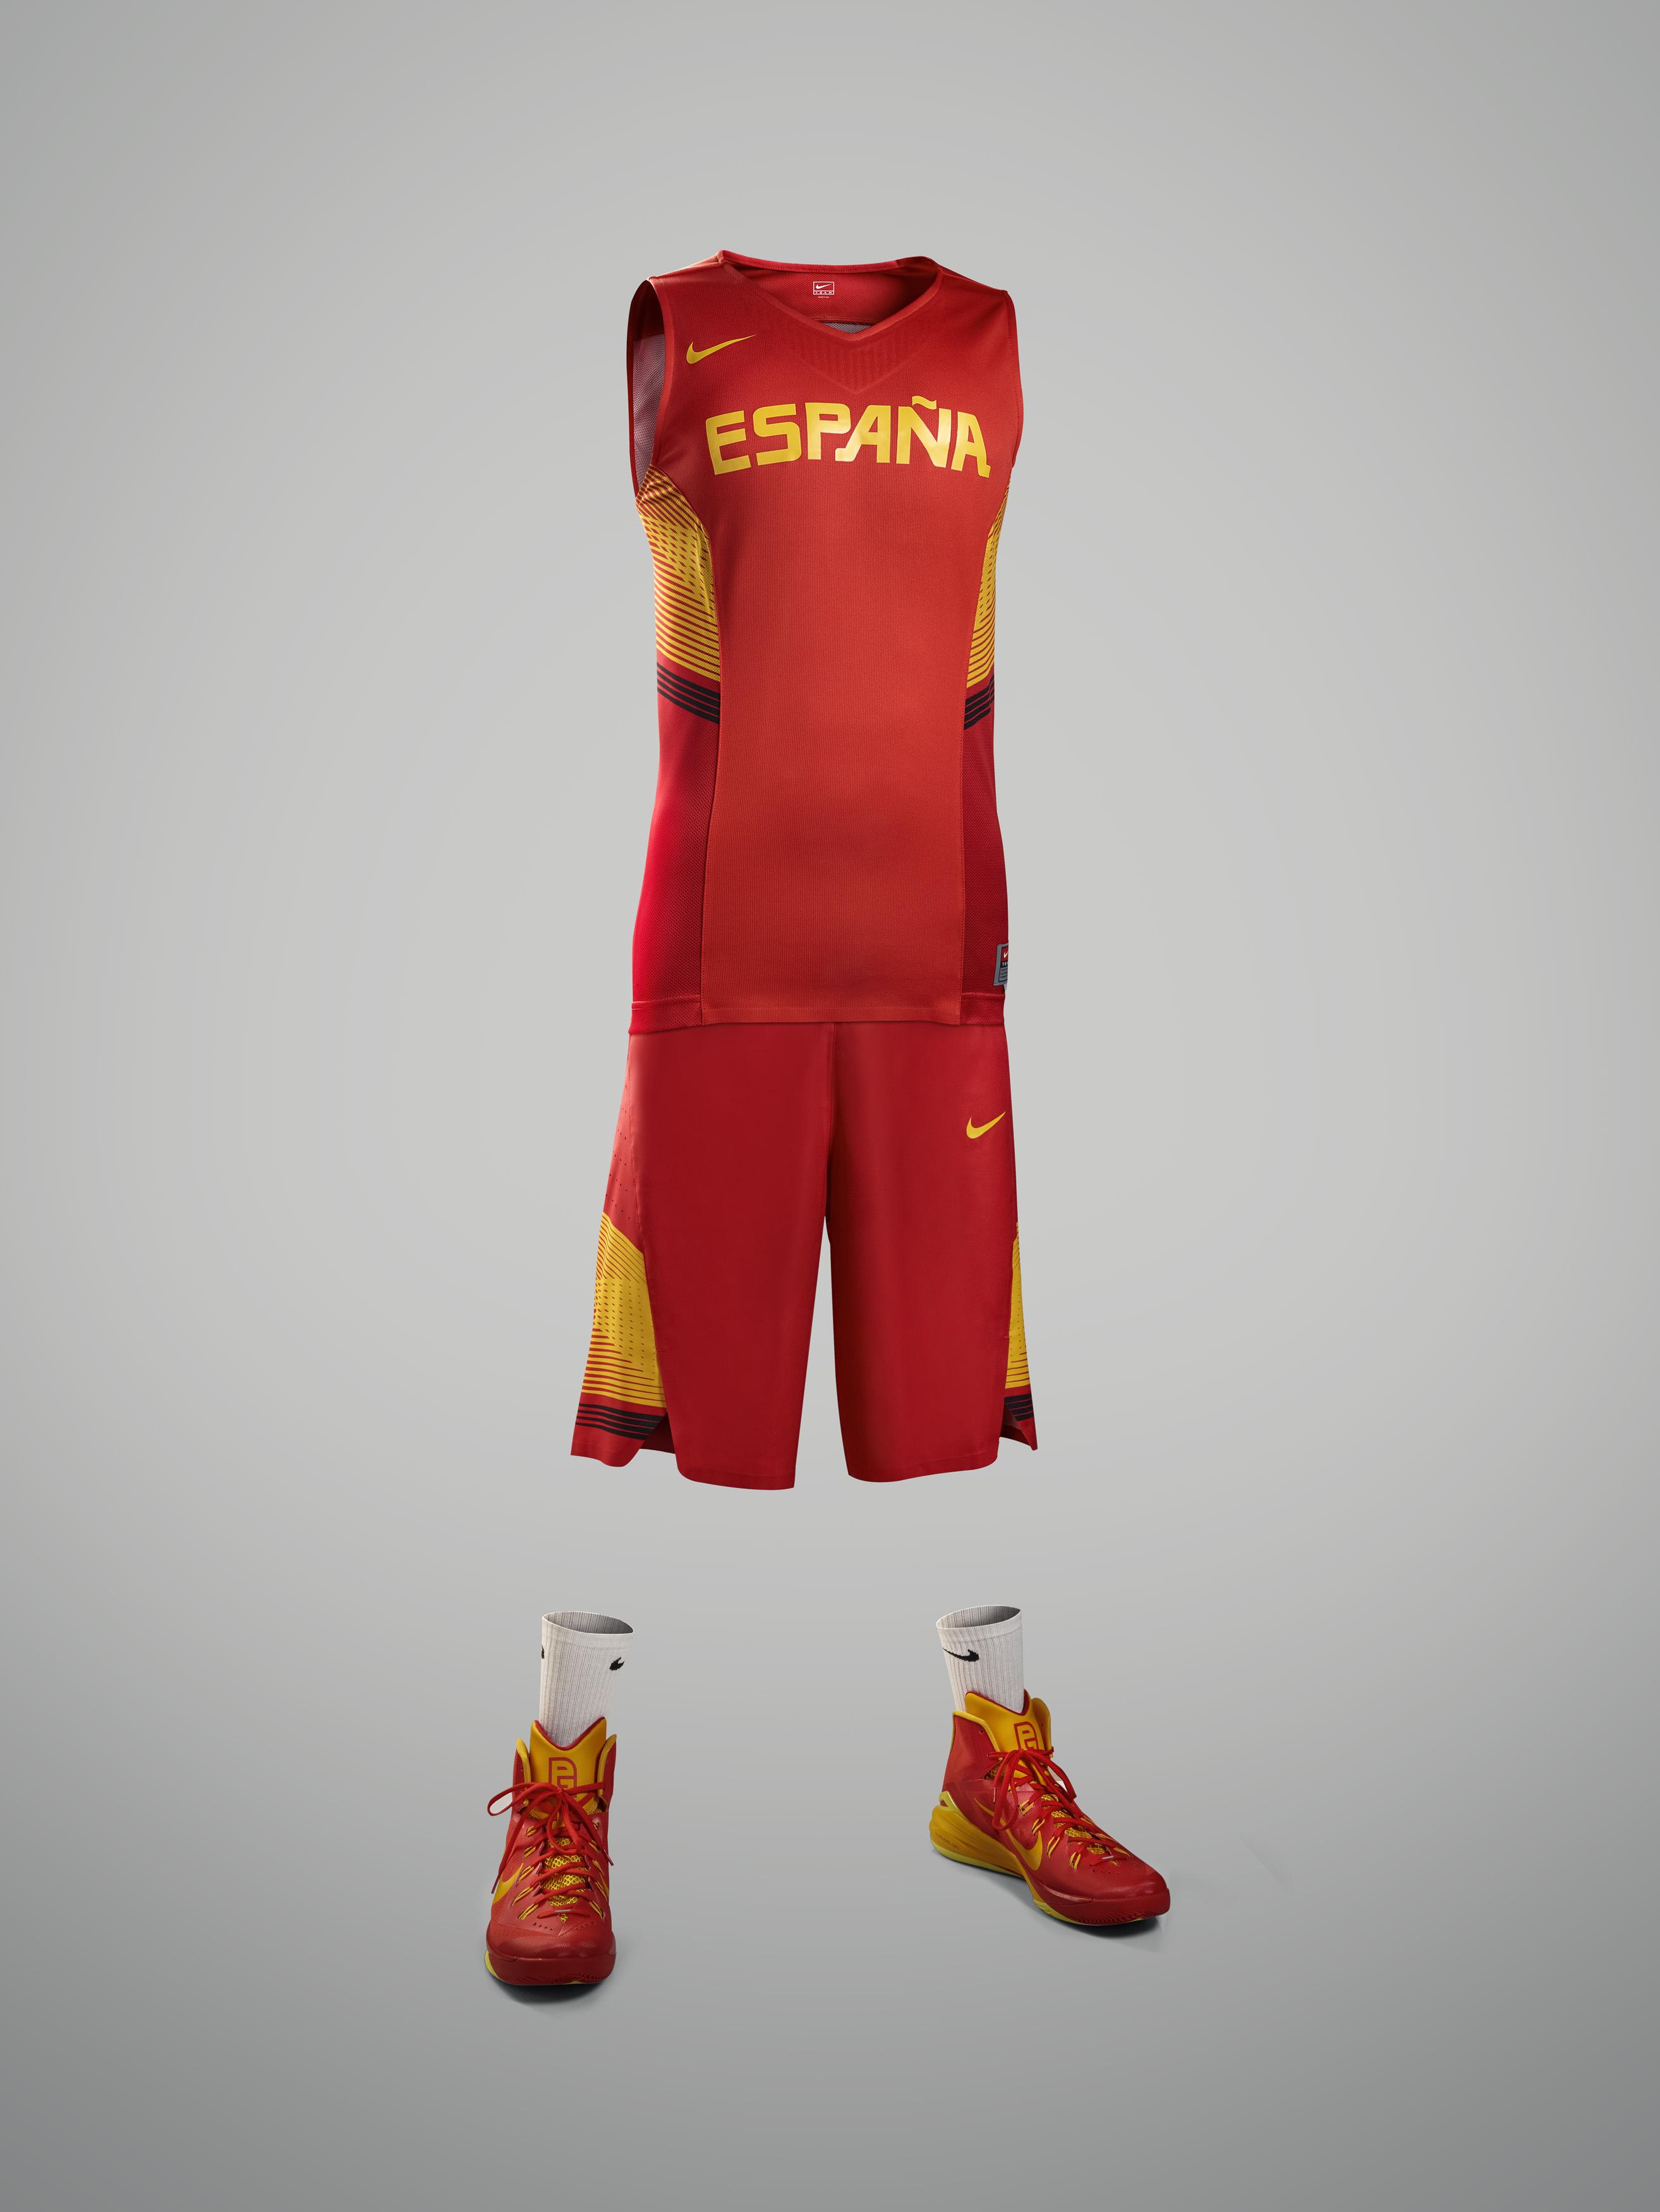 espana basketball jersey - techinternationalcorp.com 6d427e826